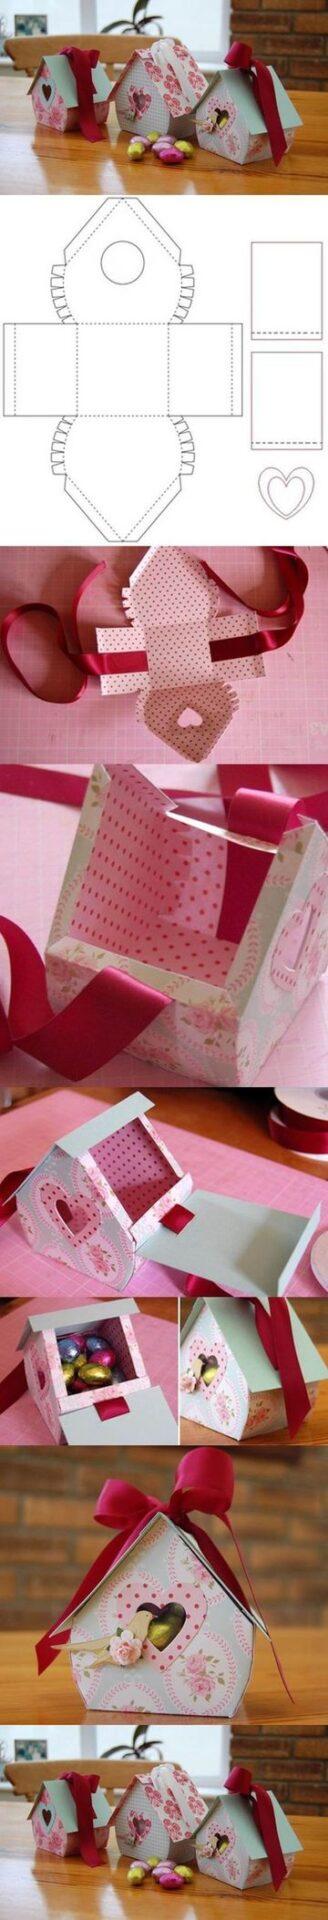 moldes de cajas para chocolates